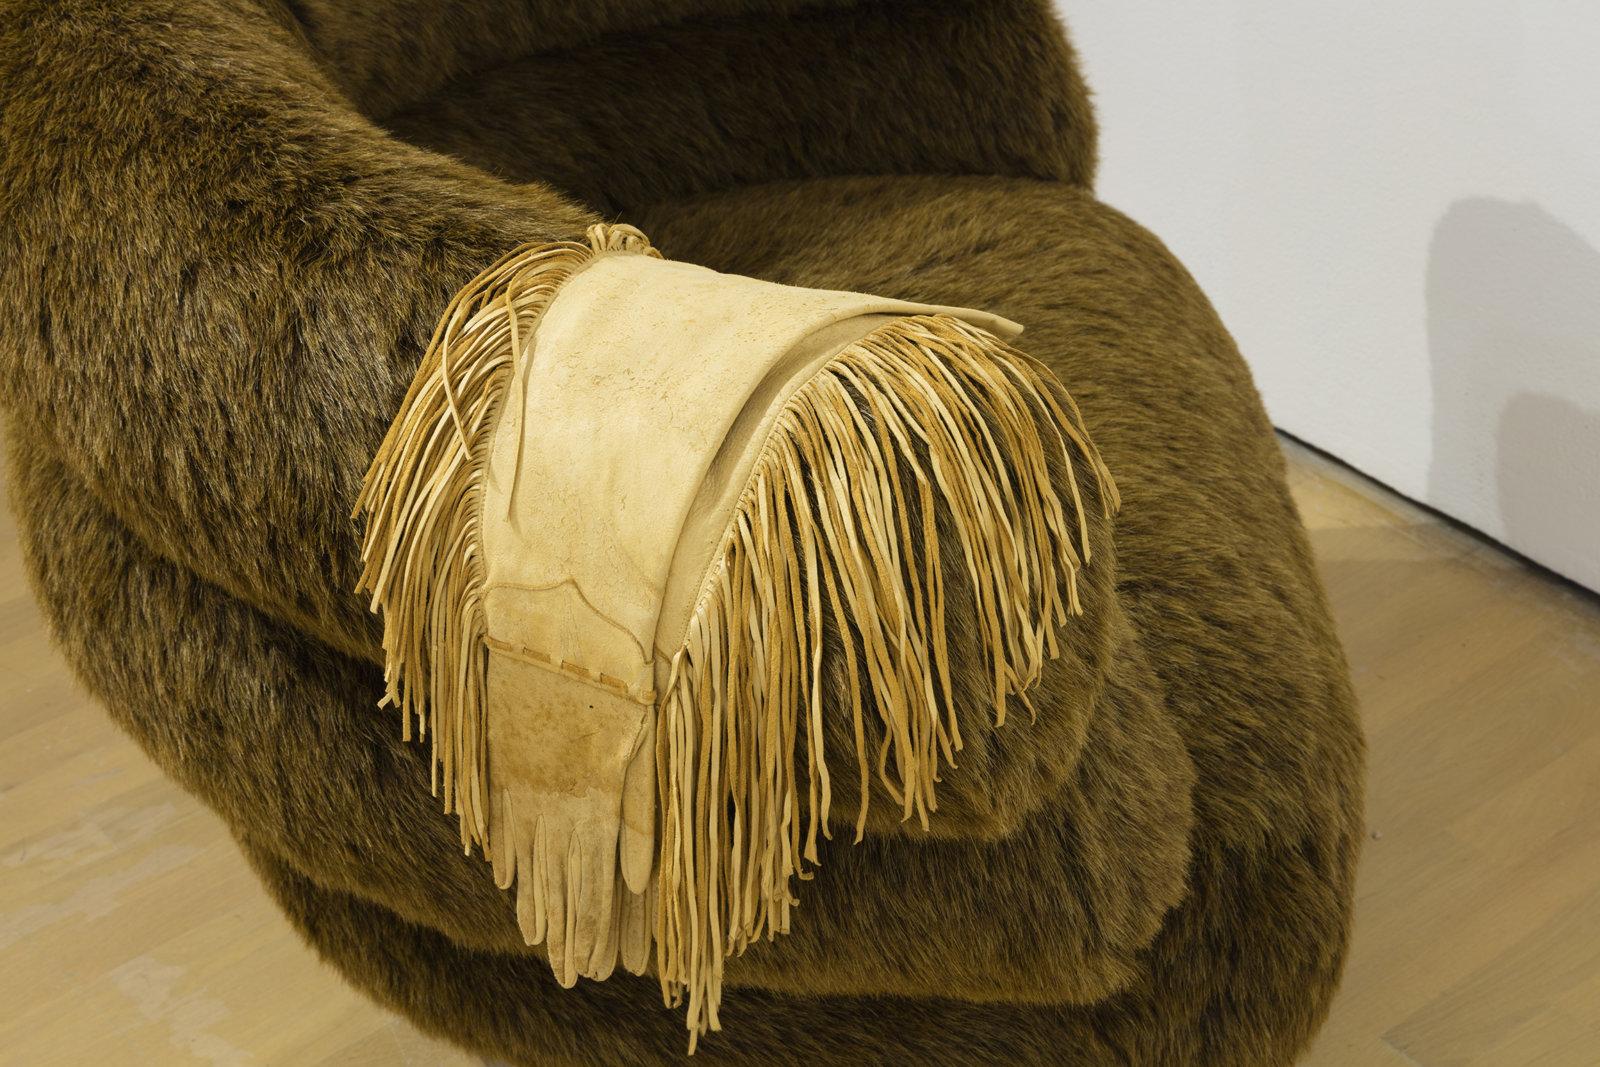 Liz Magor, Banff Chair (detail), 1991, steel base, soft polyurethane foam, synthetic fur, deerskin gloves, 30 x 35 x 44 in. (77 x 88 x 111 cm). Installation view, Habitude, Musée d'art contemporain de Montréal, 2016 by Liz Magor